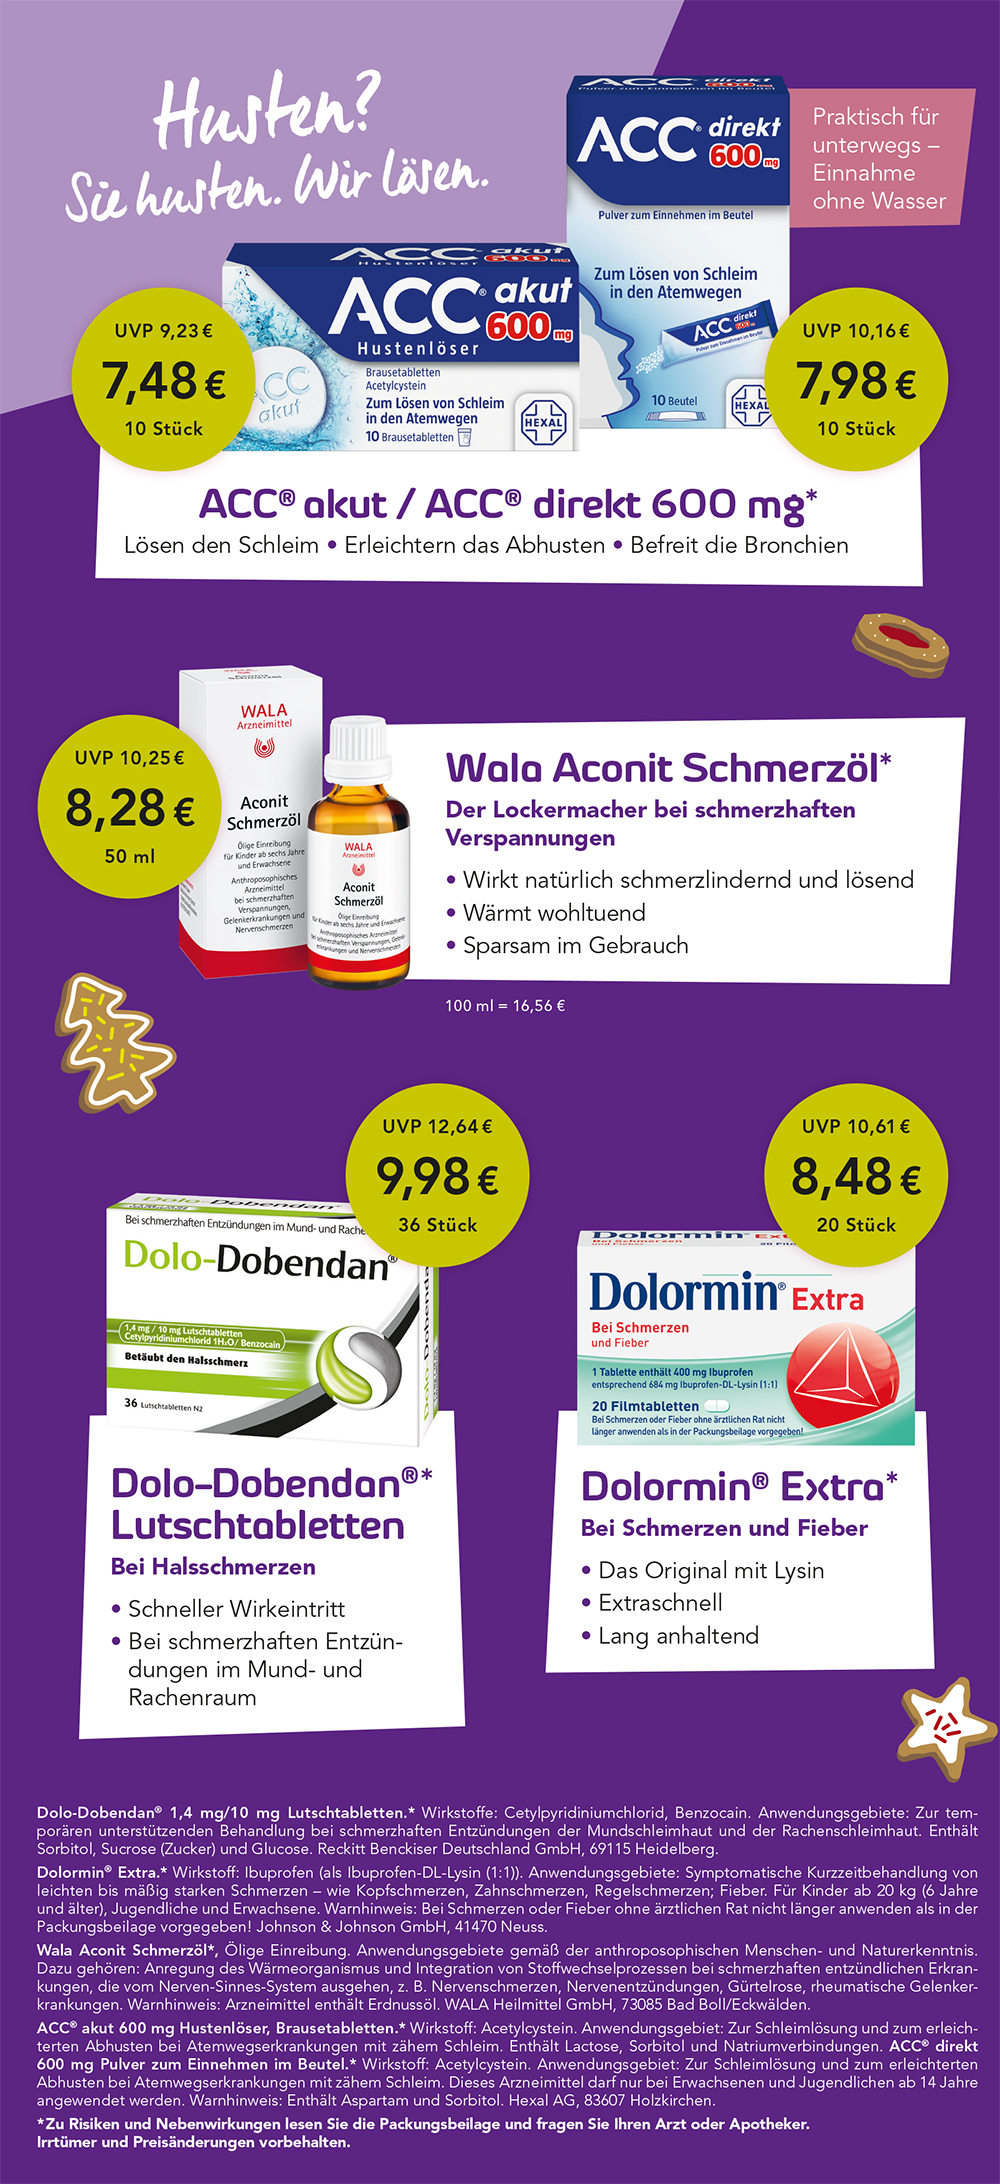 http://www.apotheken.de/fileadmin/clubarea/00000-Angebote/37081_adler_angebot_5.jpg